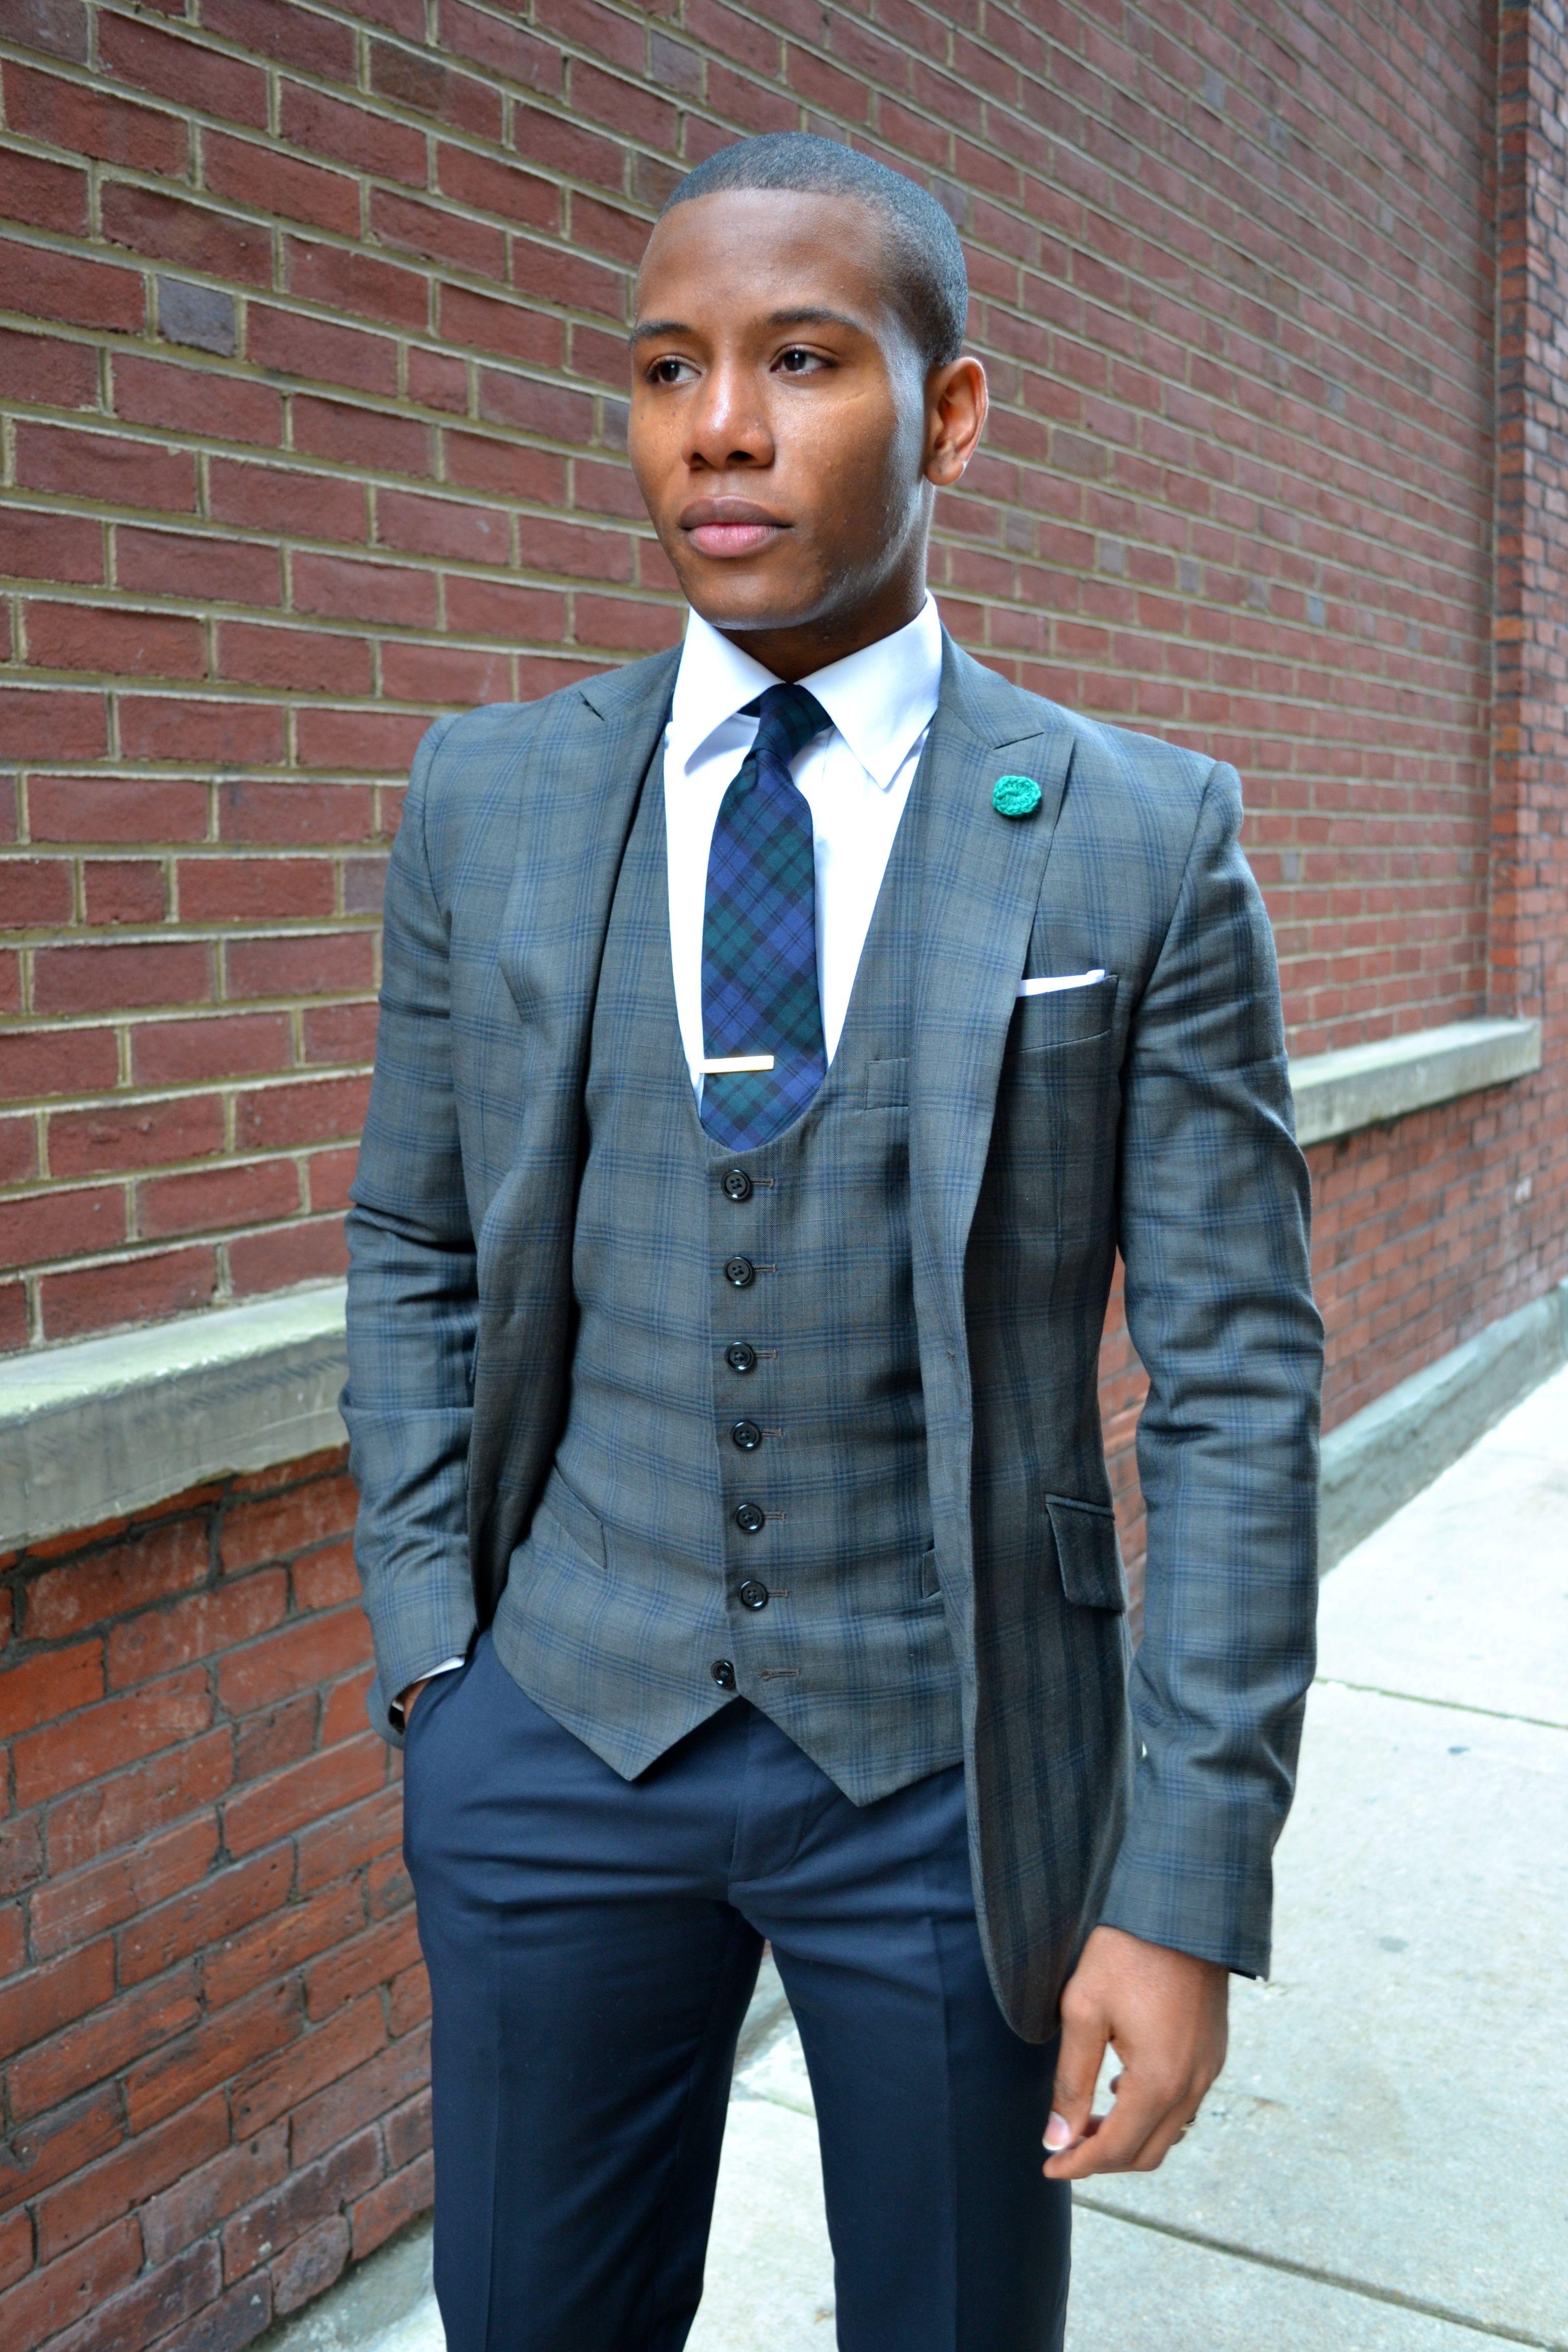 Pin by Men\'s Style Pro on Men\'s Style Pro Official | Pinterest ...